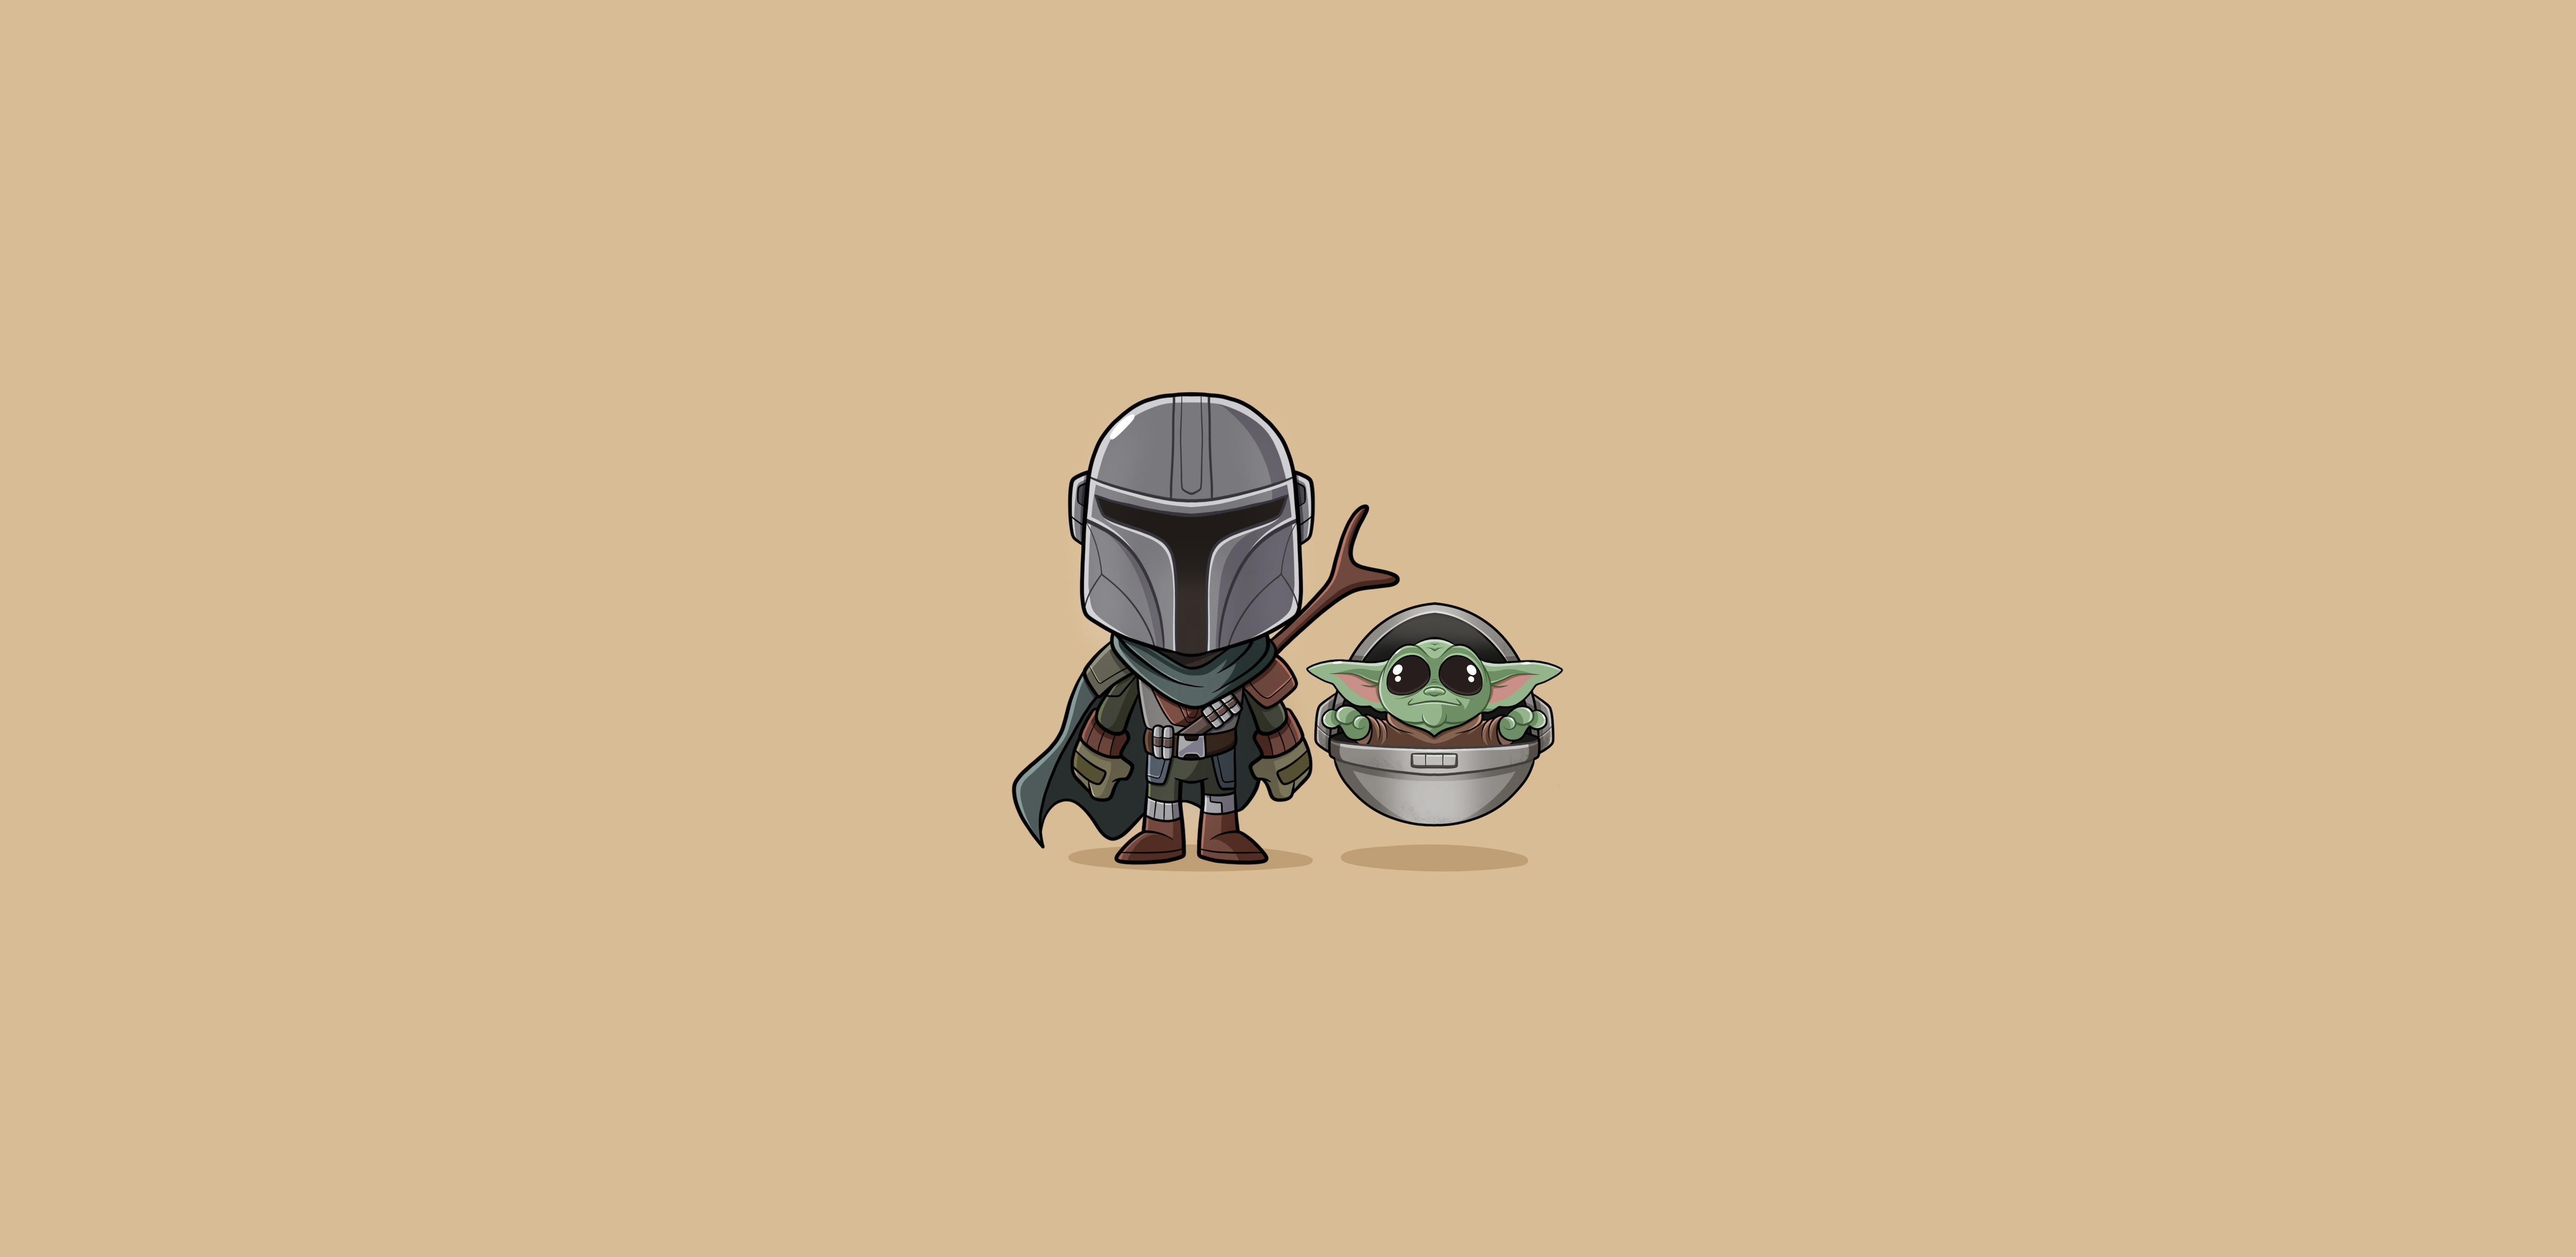 Wallpaper : Baby Yoda, Star Wars, minimalism, illustration ...